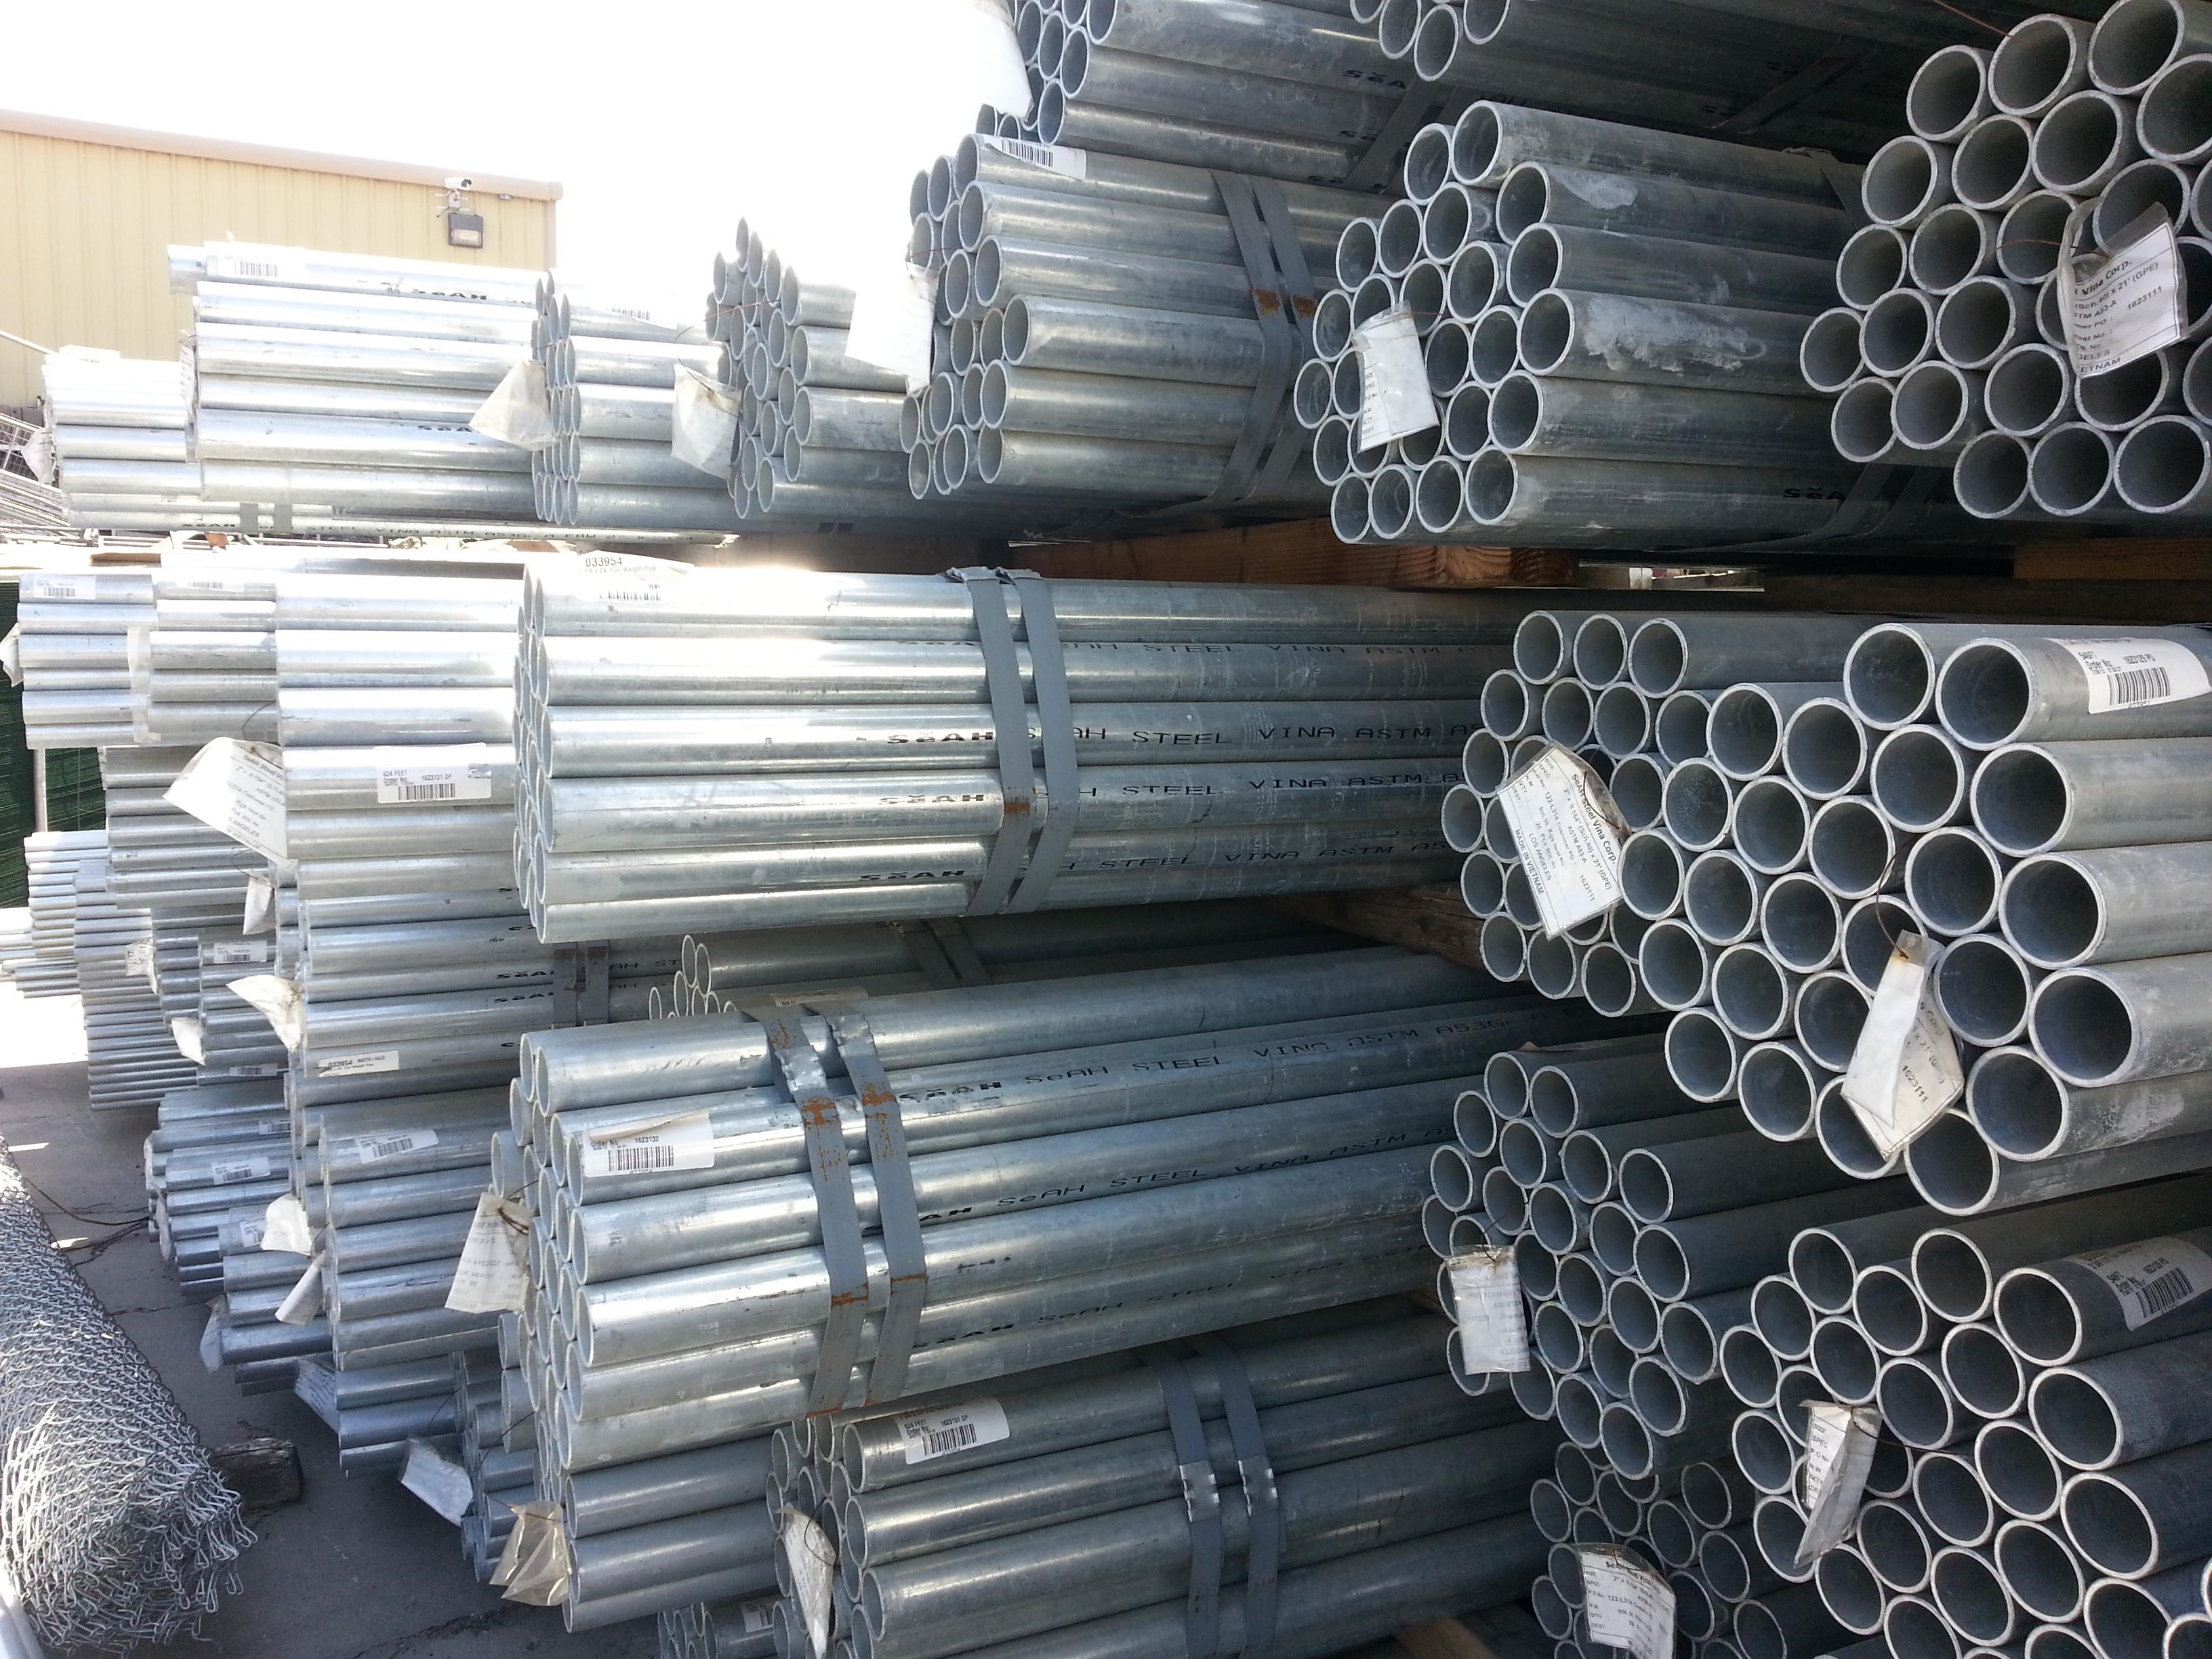 seah-steel-vina-corp-Vietnam